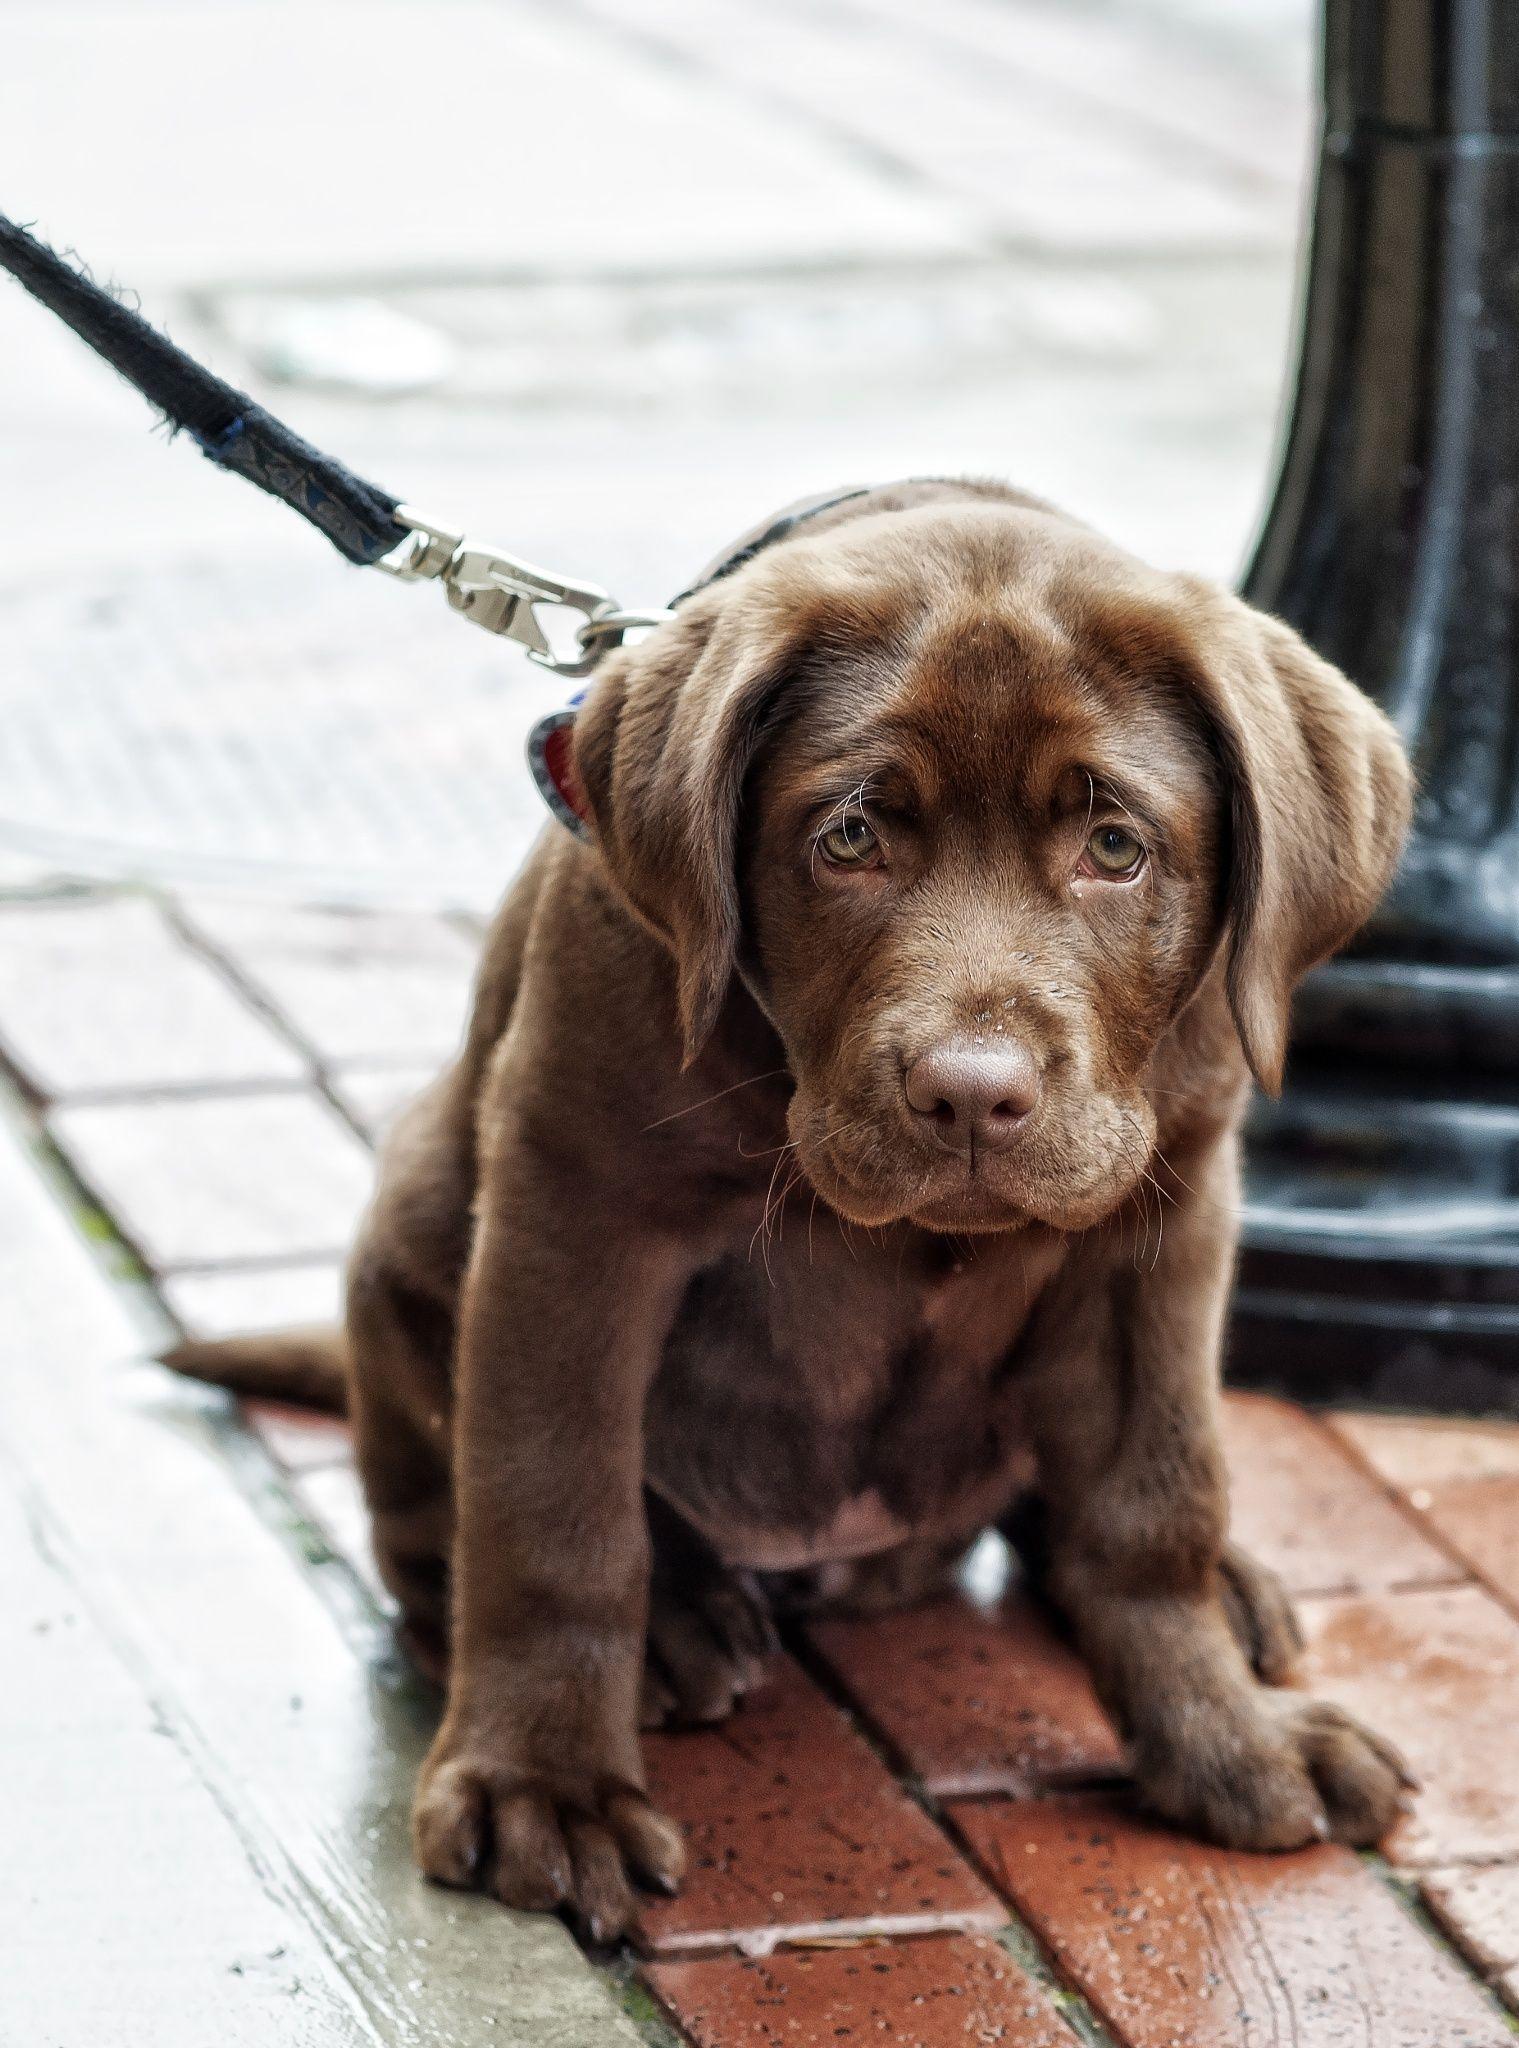 Chocolate Lab Puppy   Cute & Fuzzy   Pinterest   Chocolate lab ...